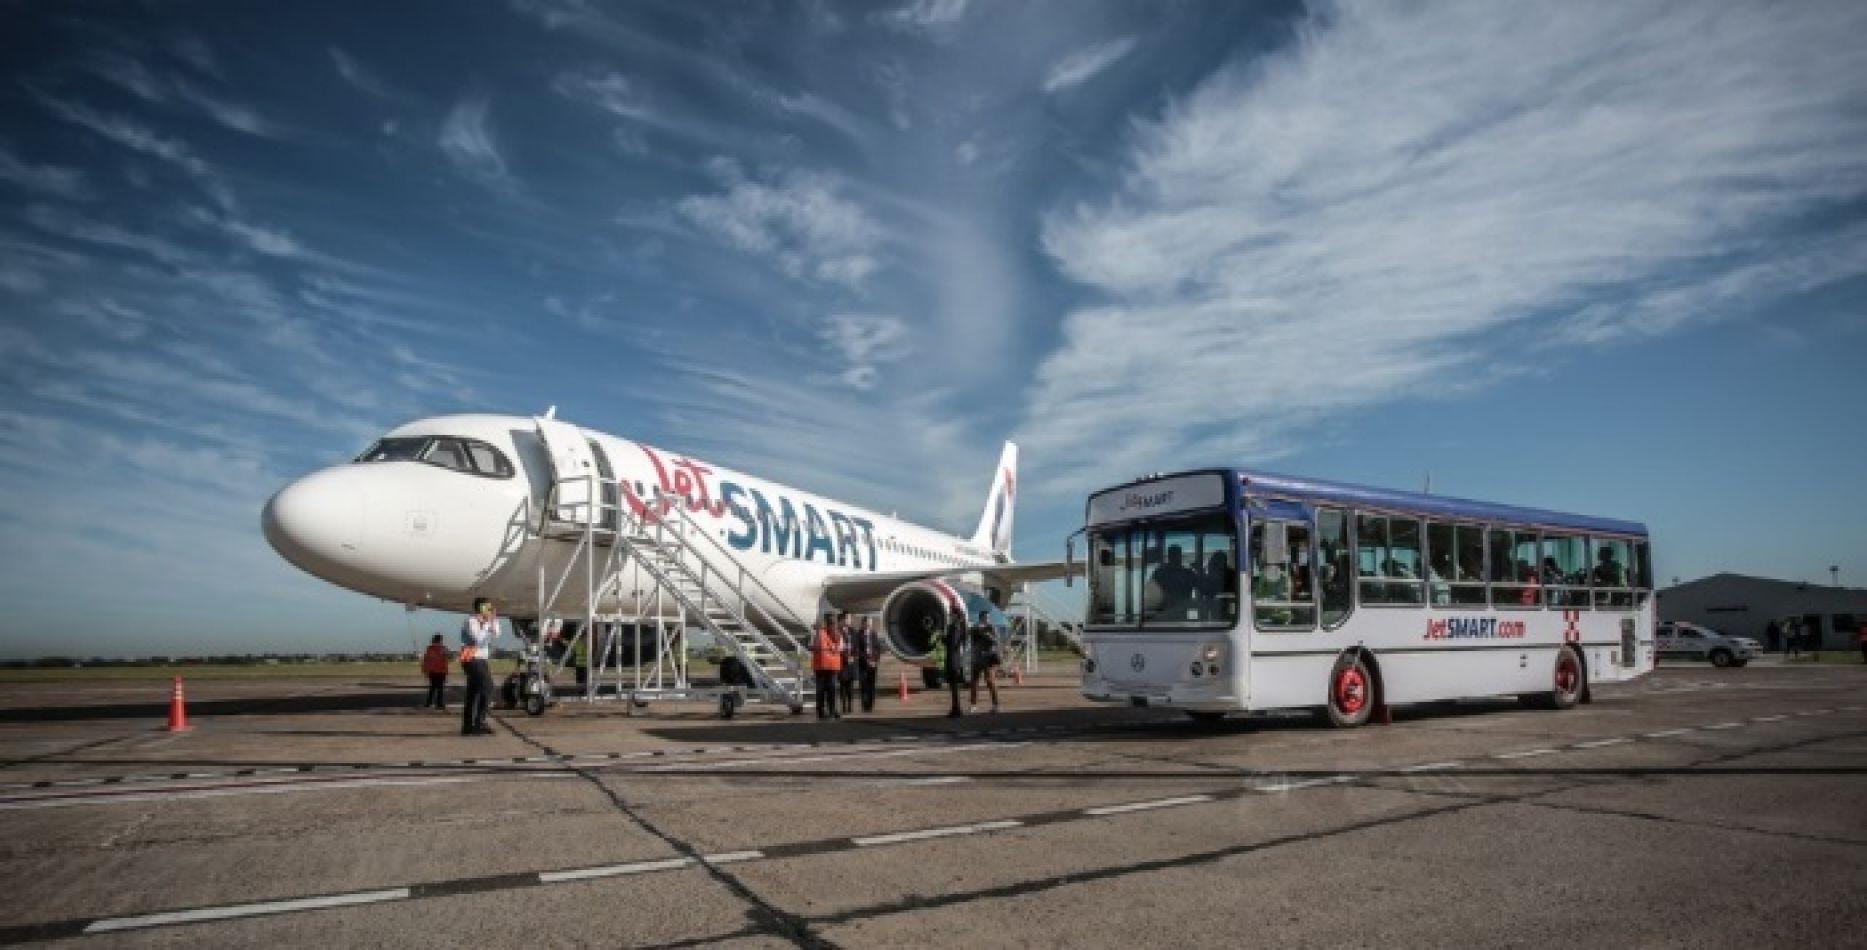 Salteños podrán volver a volar en Jetsmart pese a la pandemia